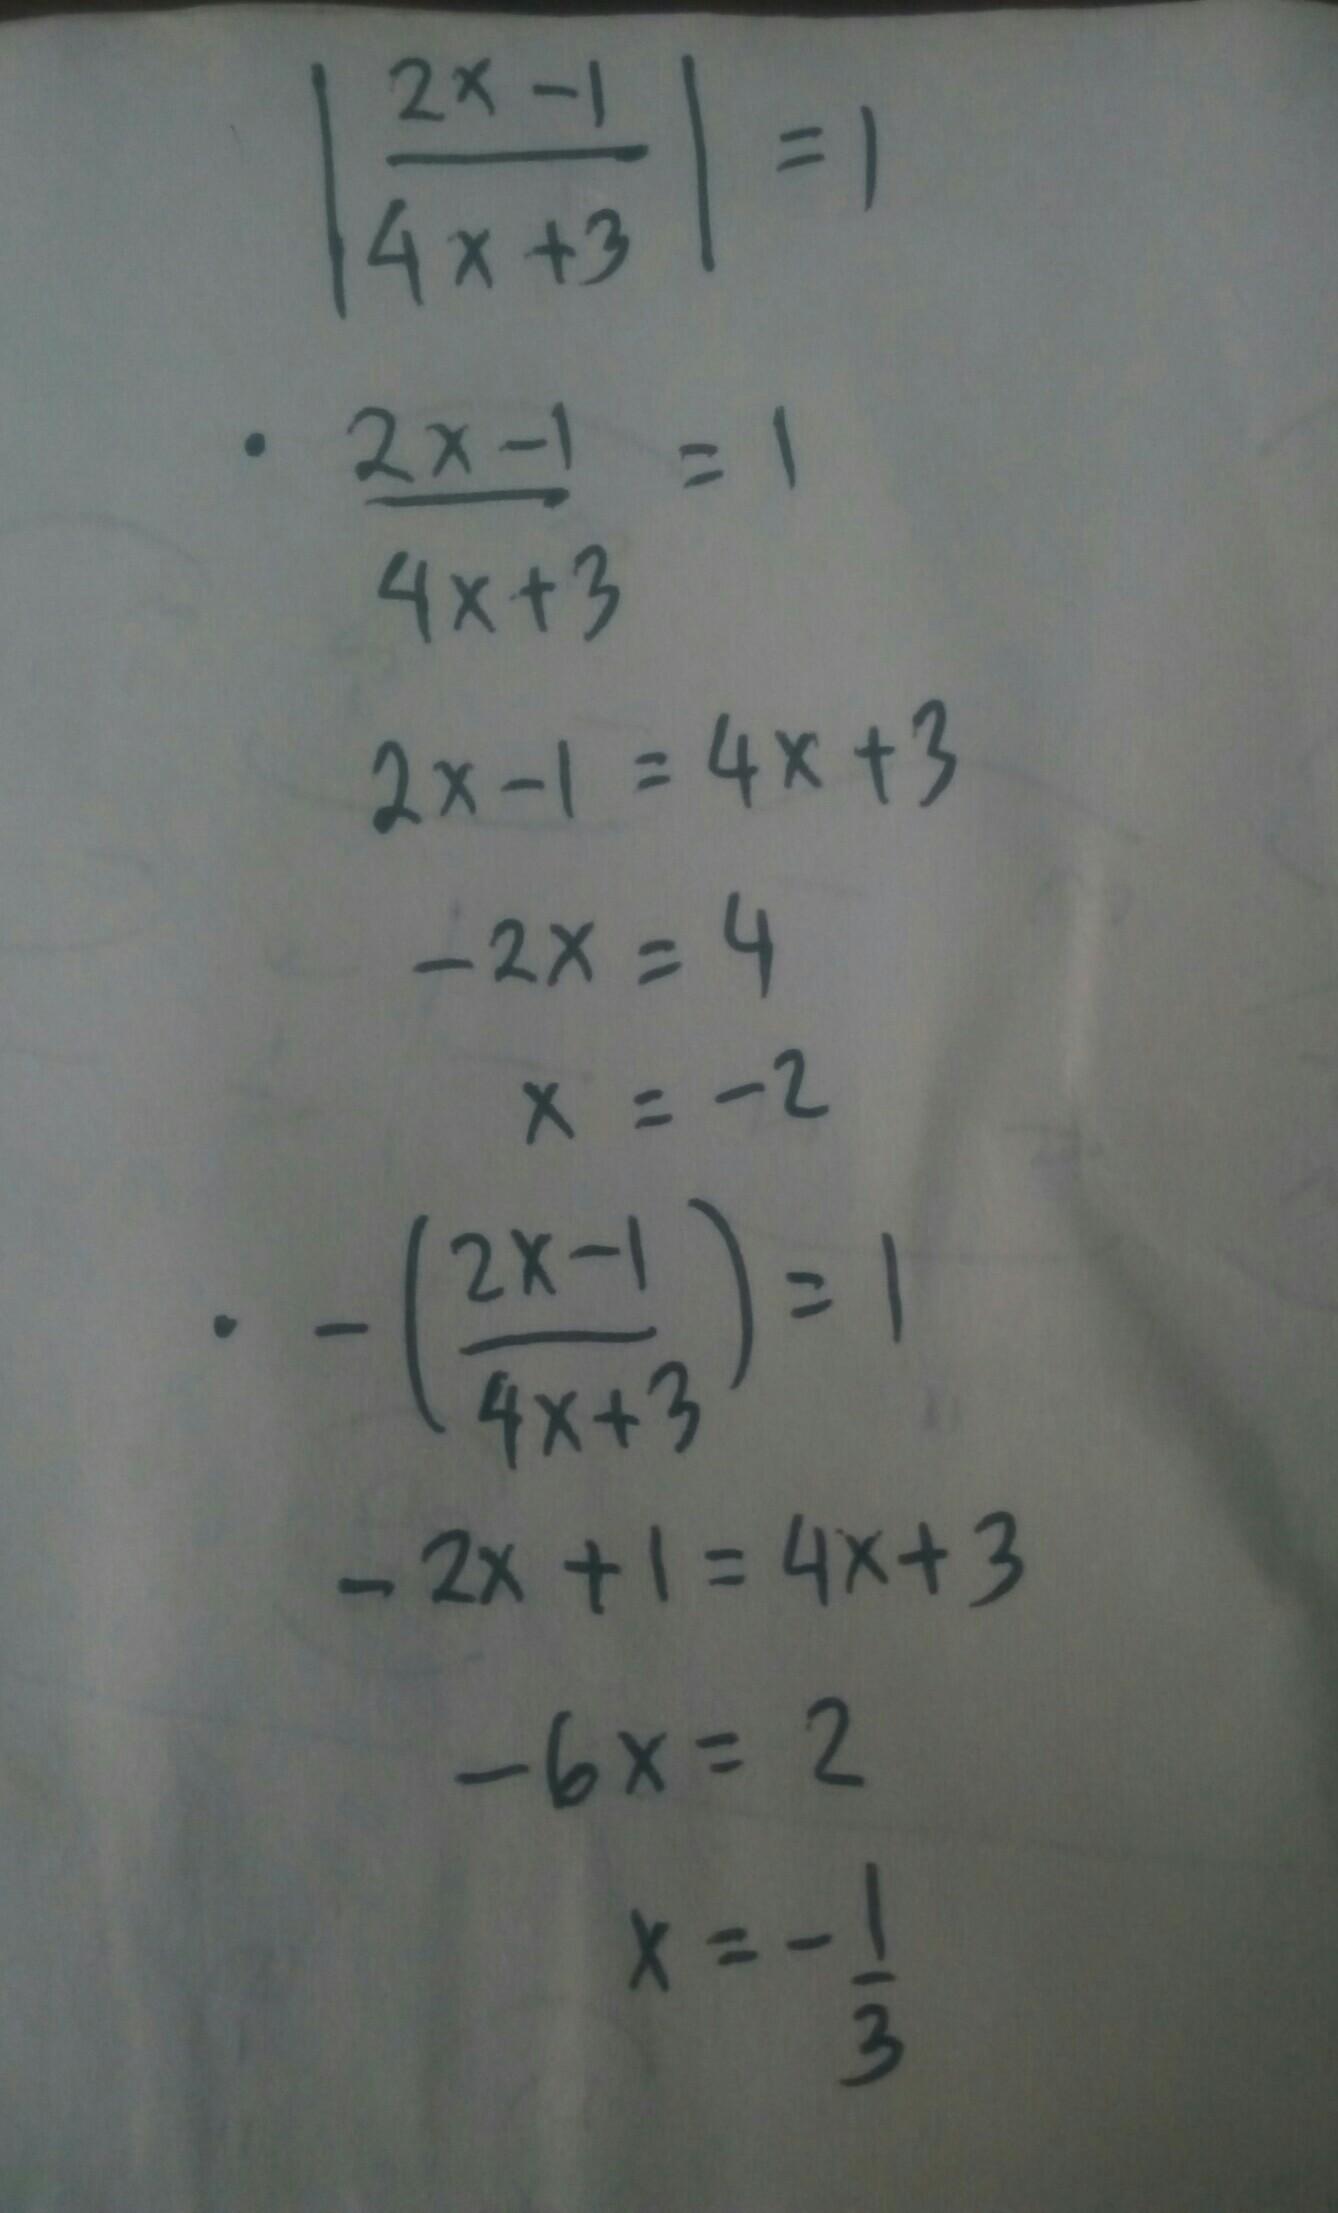 Nilai X Dari Persamaan Nilai Mutlak Berikut 2x 1 4x 3 1 Adalah Brainly Co Id